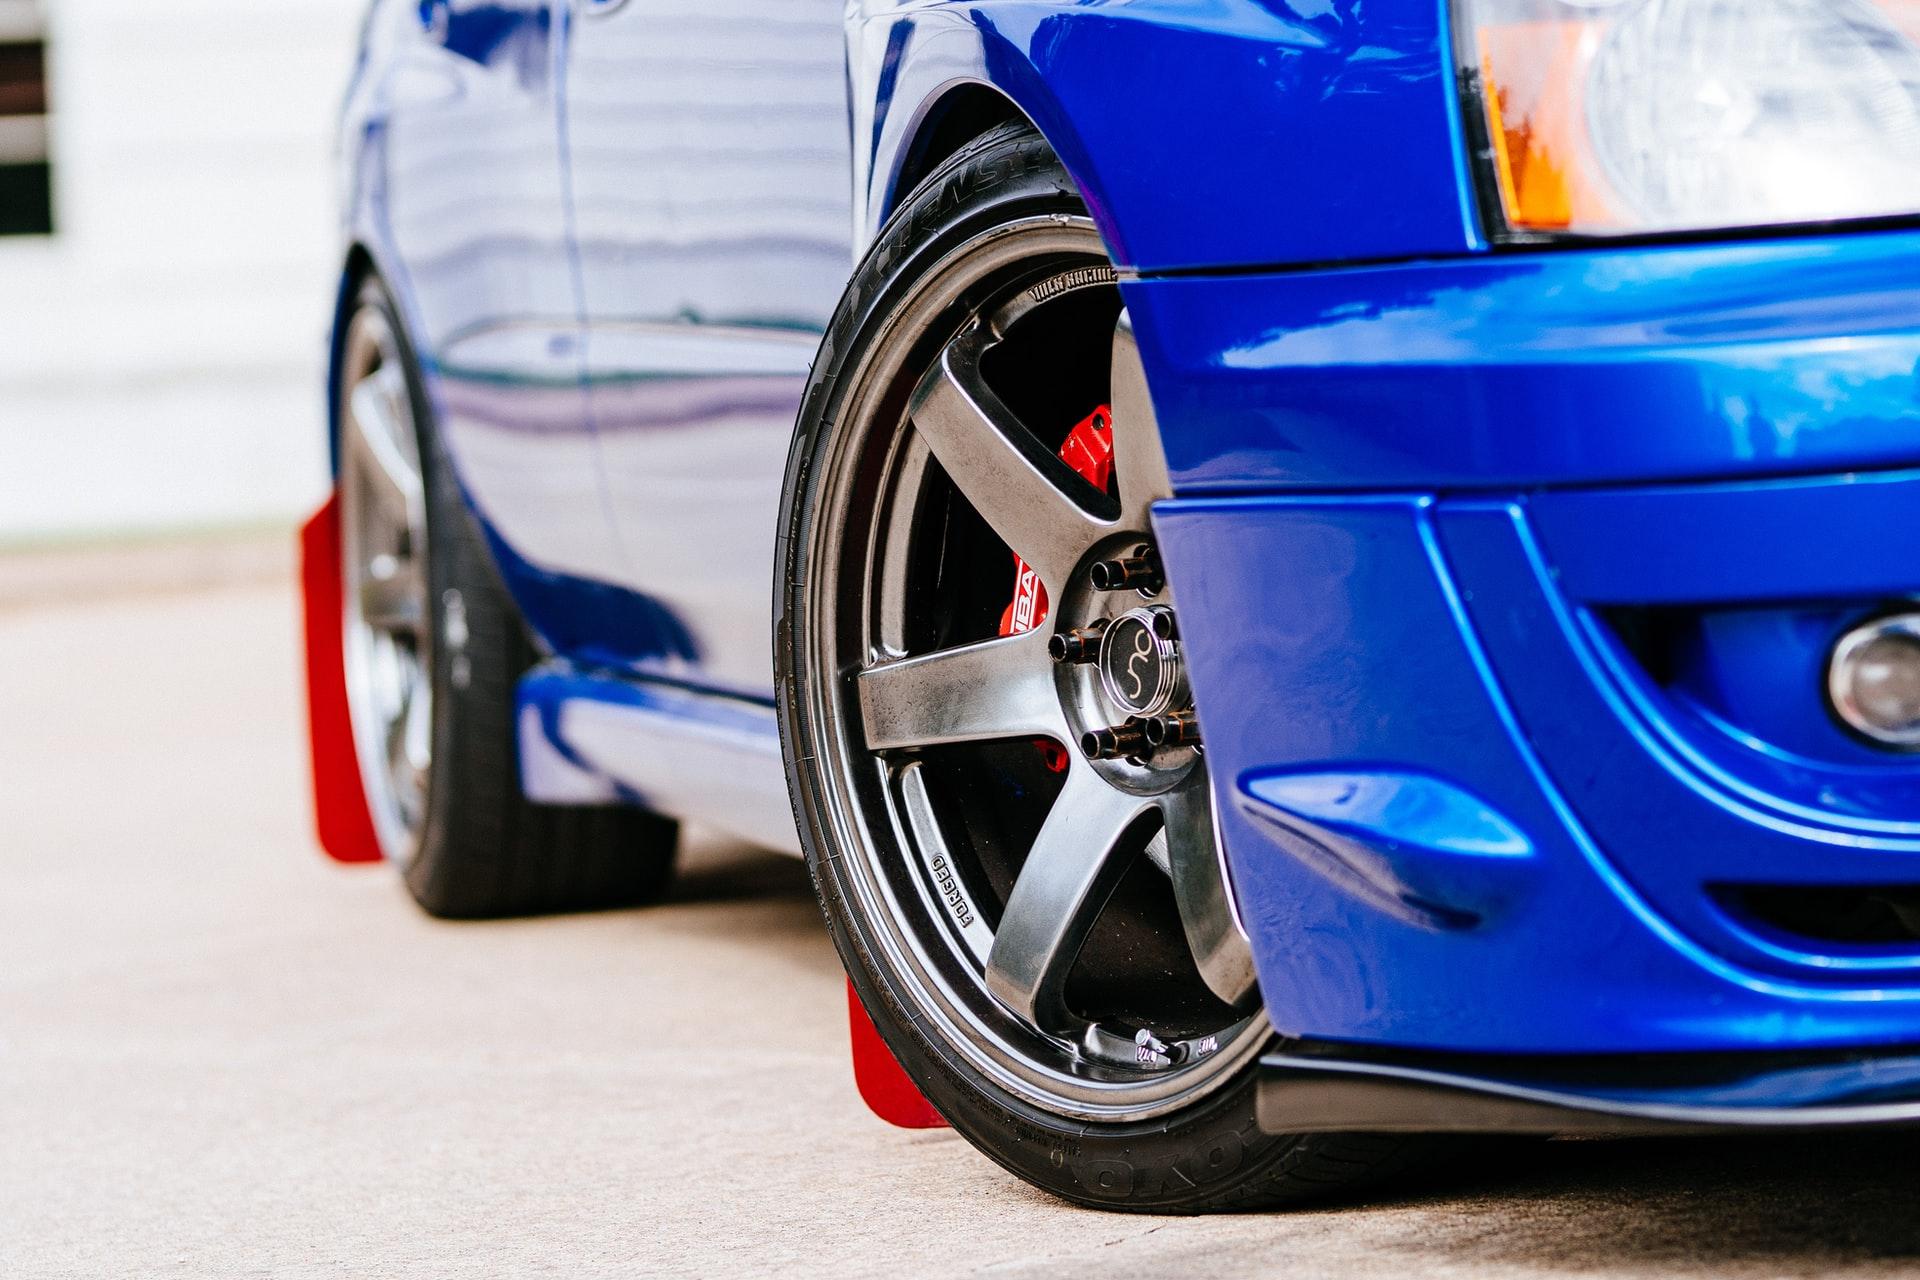 Finland's Nokian creates 'long-life' tyres